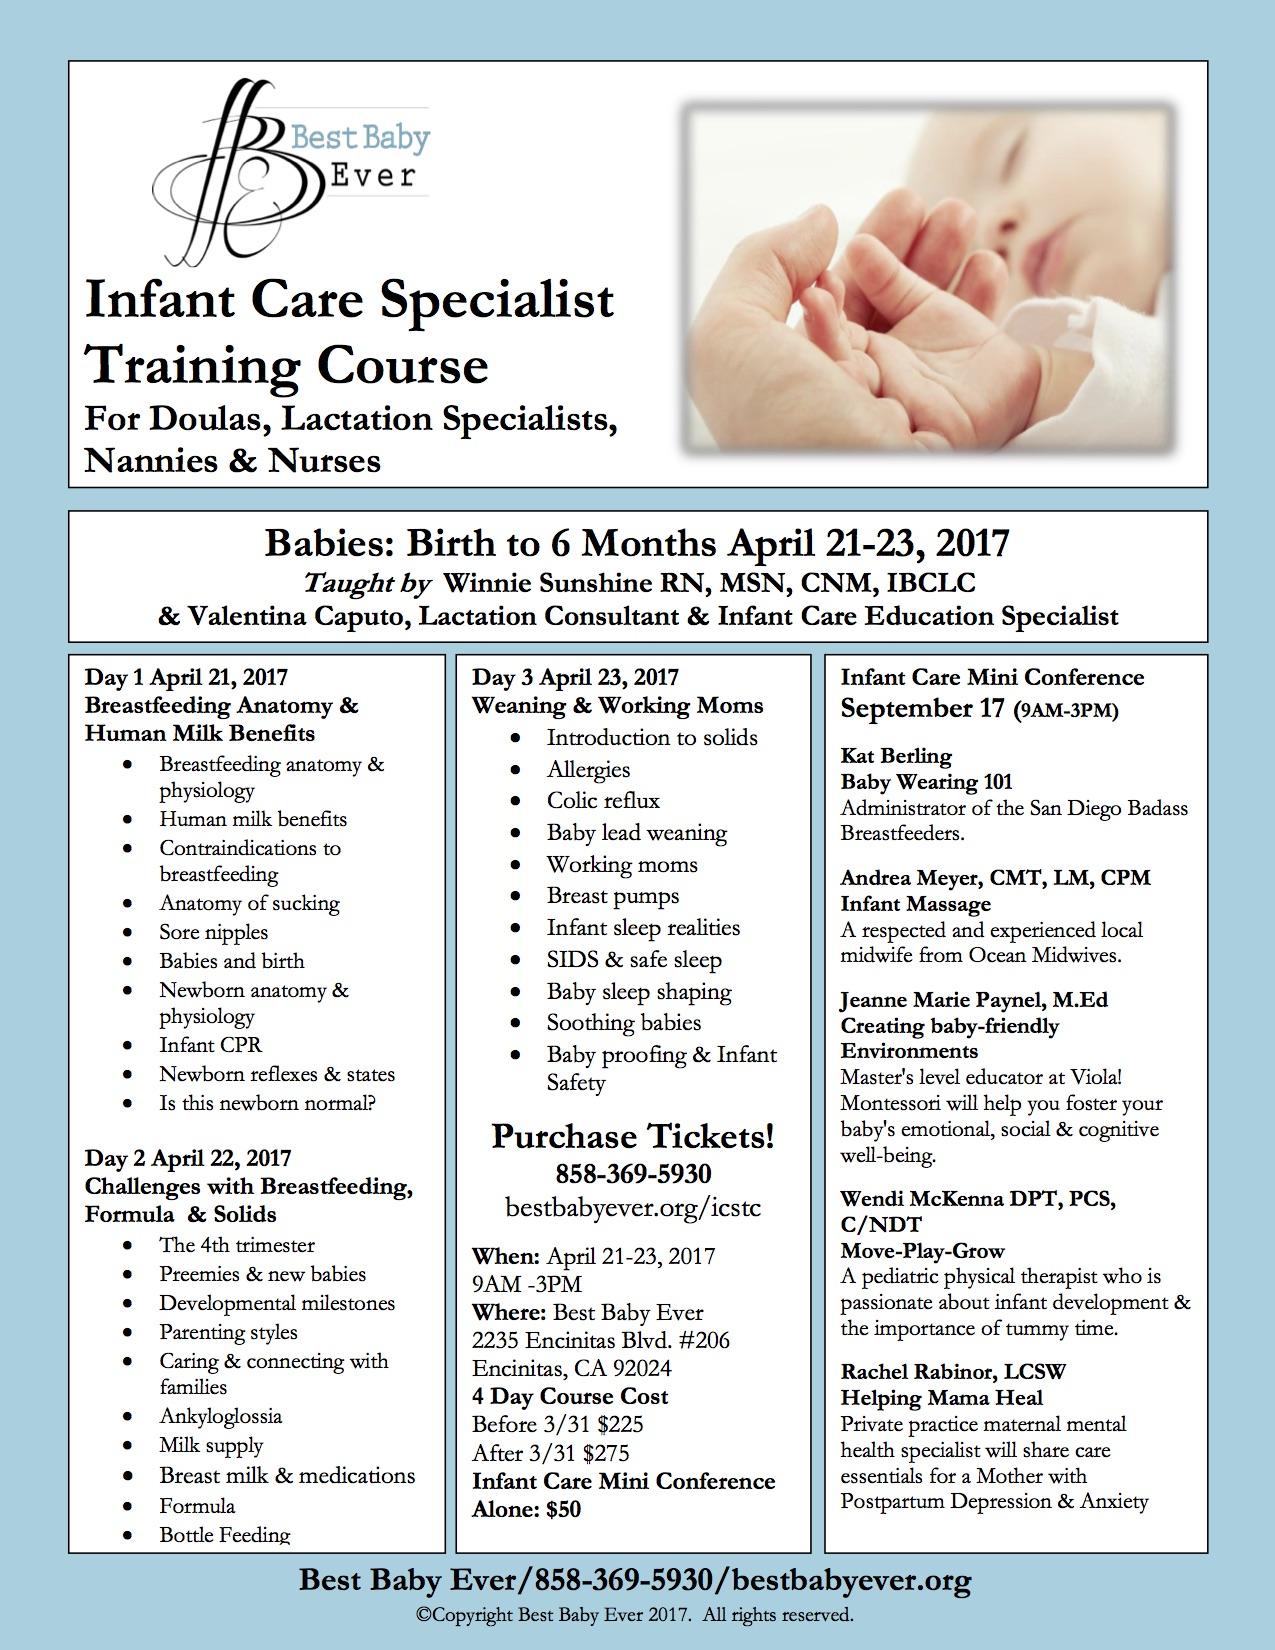 Infant Care Specialist Training Course April 21-23, 2017